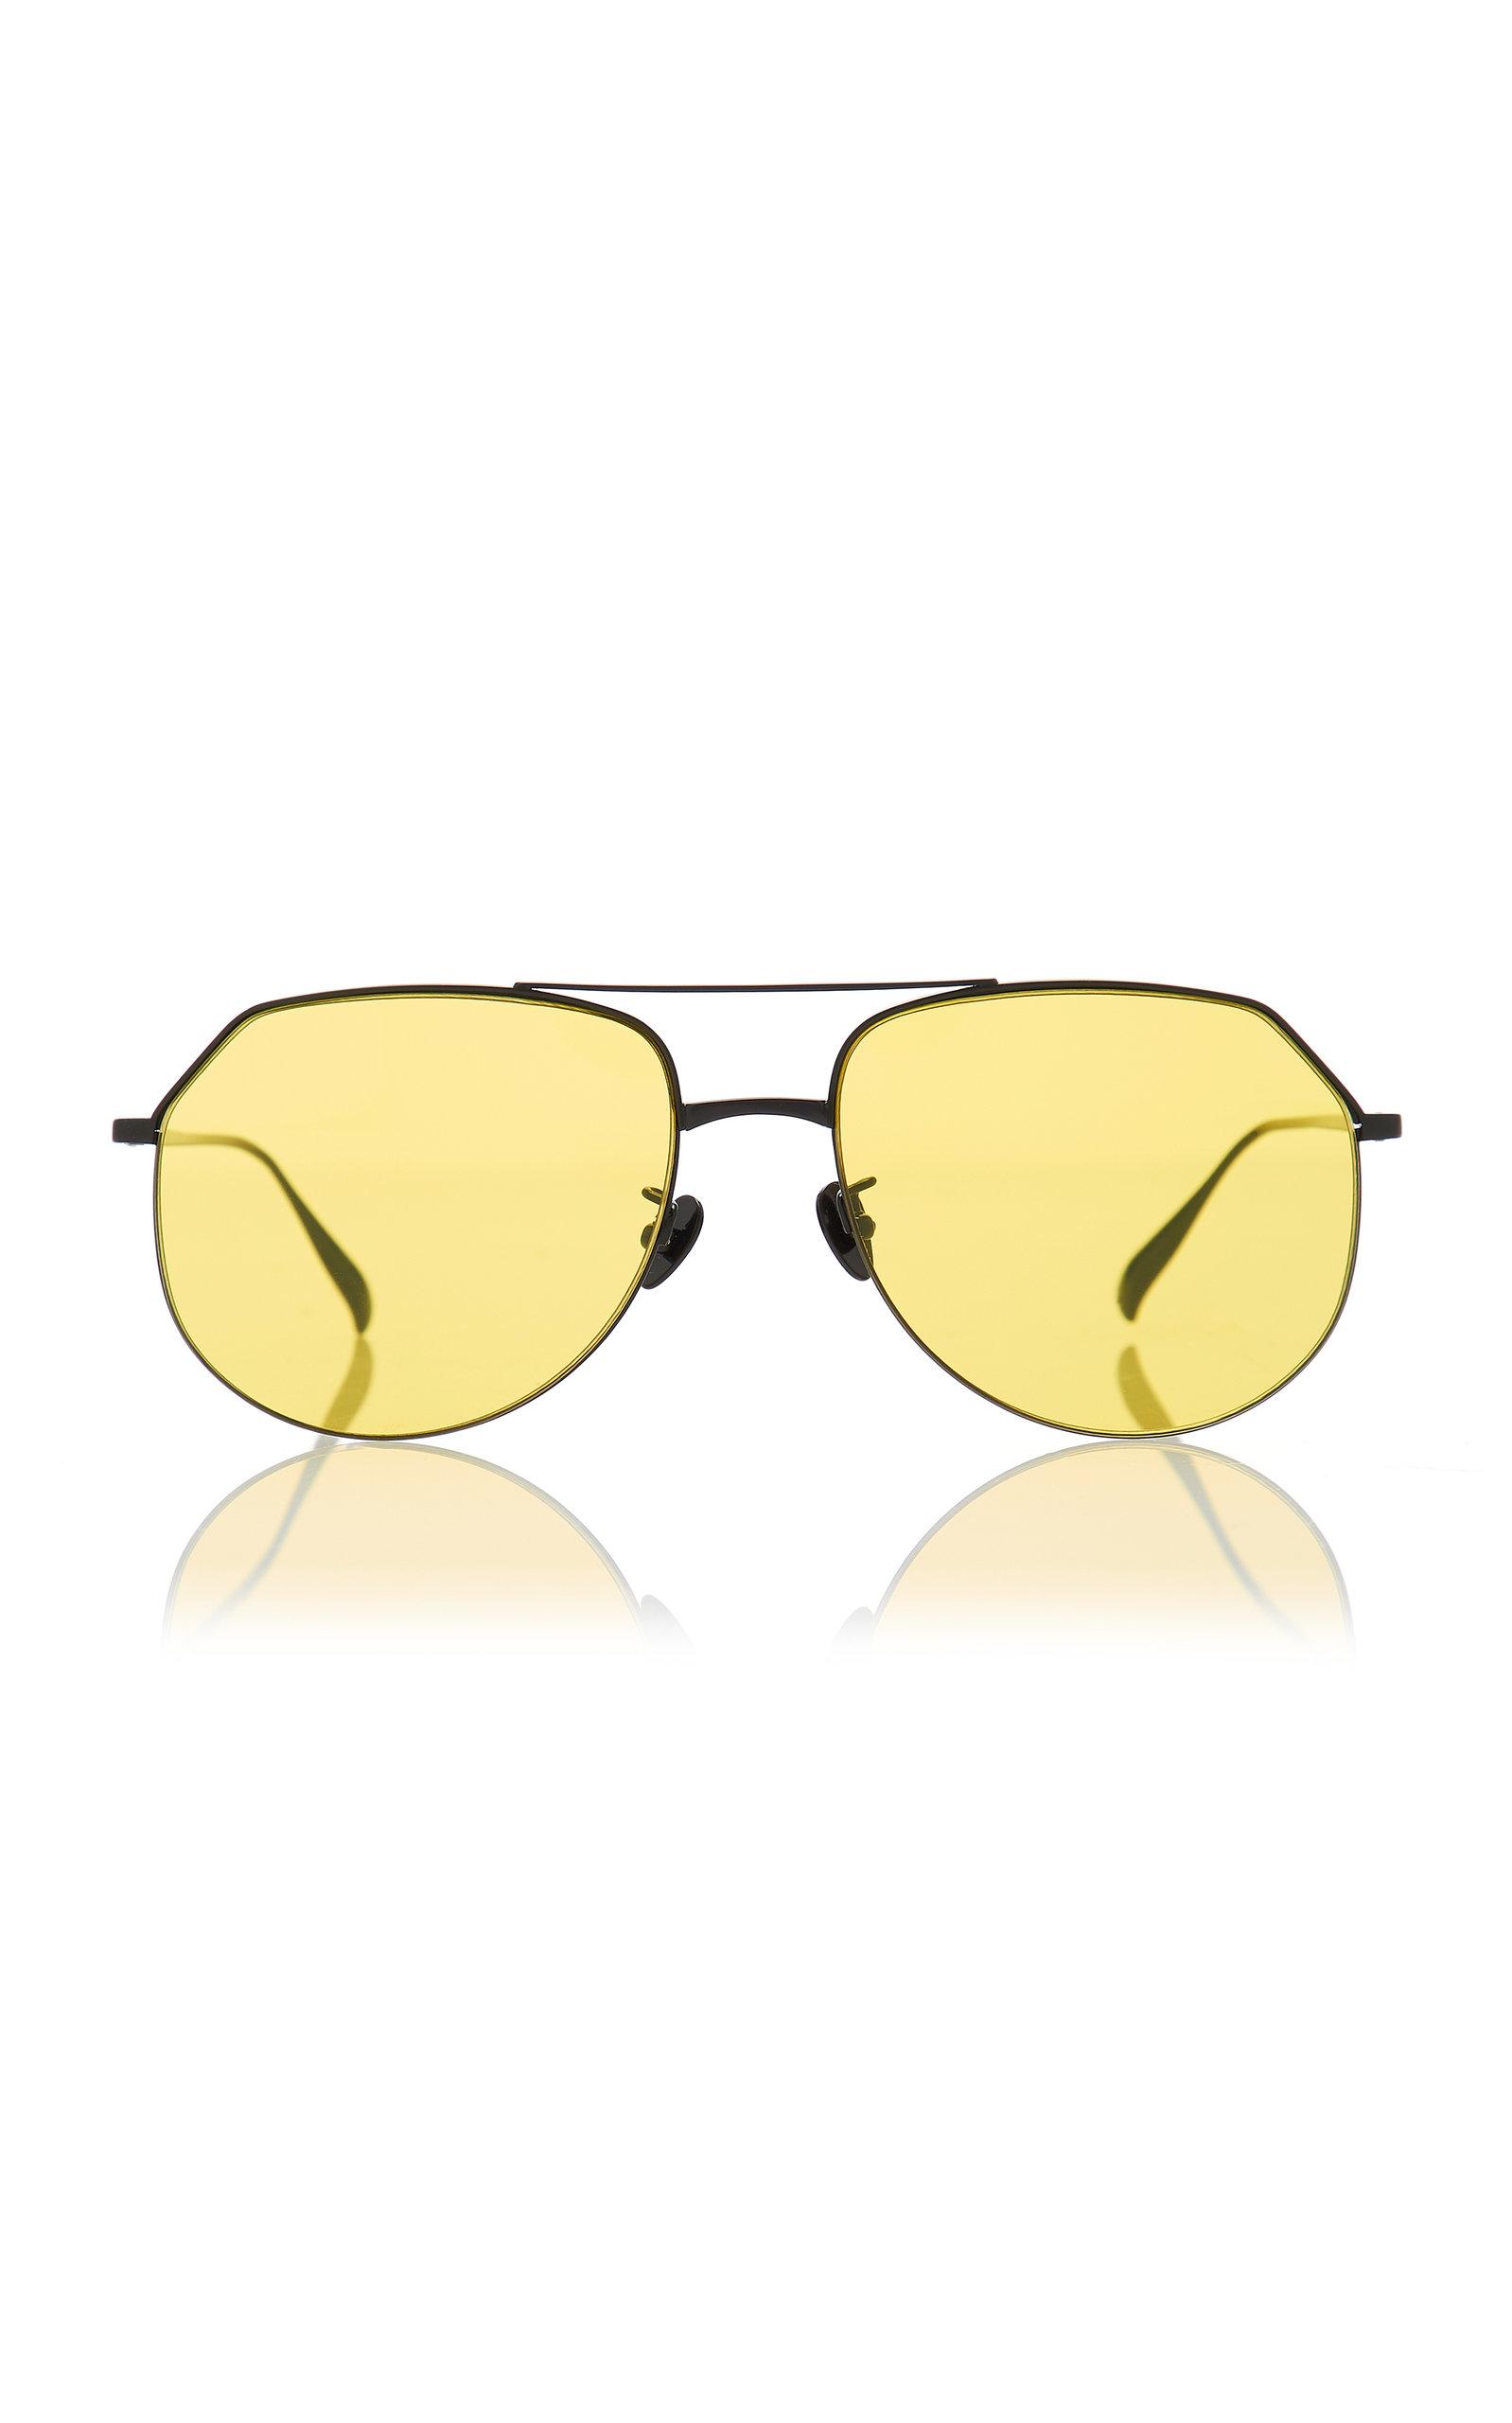 69007f7af7 Projekt Produkt Oversized Aviator Sunglasses In Yellow